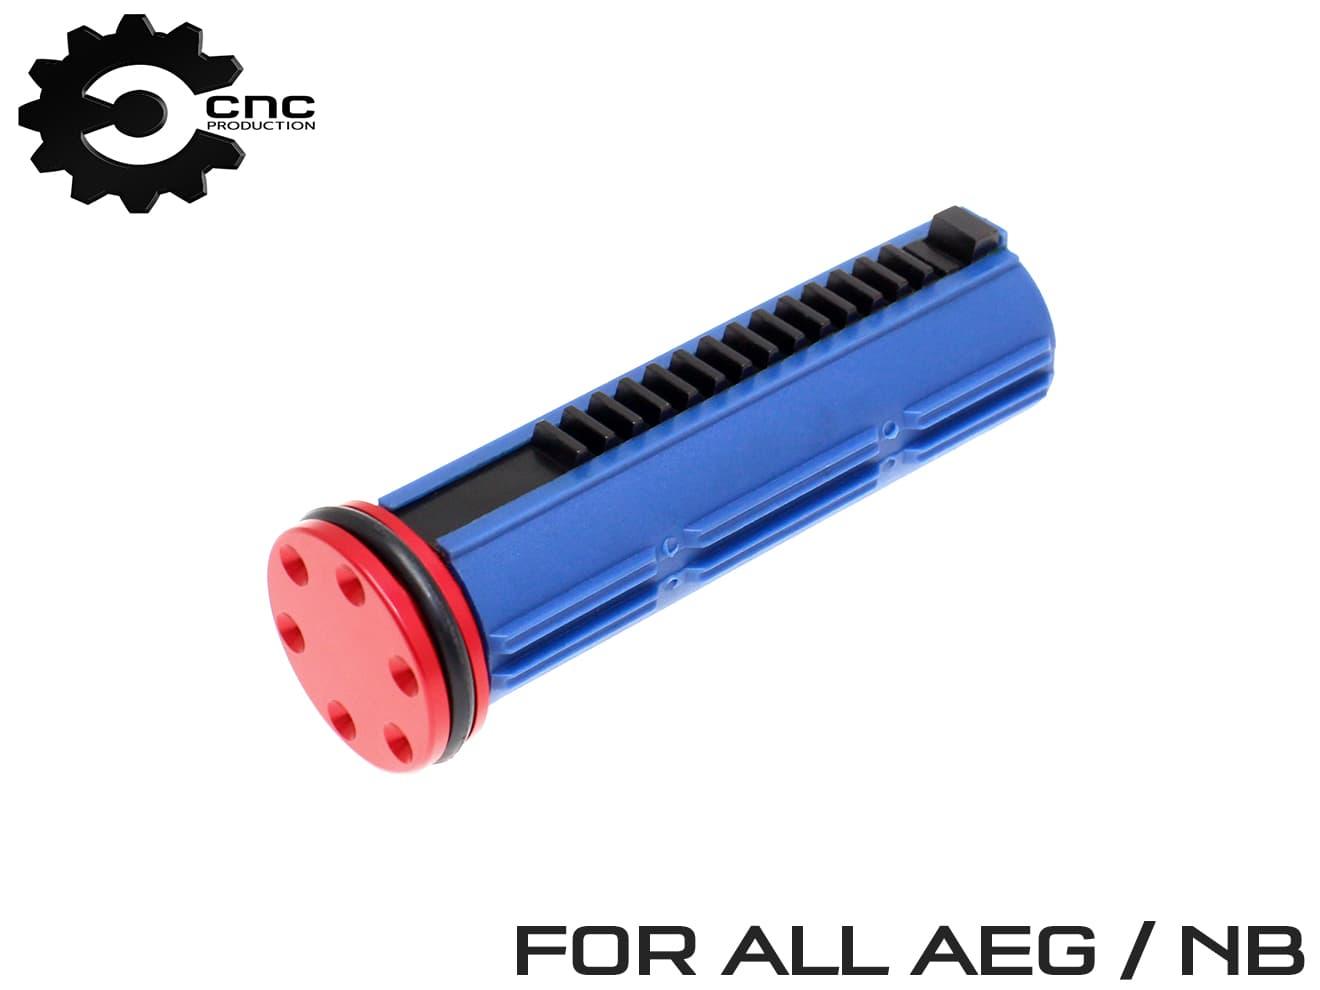 CNC Production AEG 14.5T ナイロンファイバーピストン+6ホール ベアリング ピストンヘッド◆電動ガン ノーマルボアシリンダー用 高強度画像